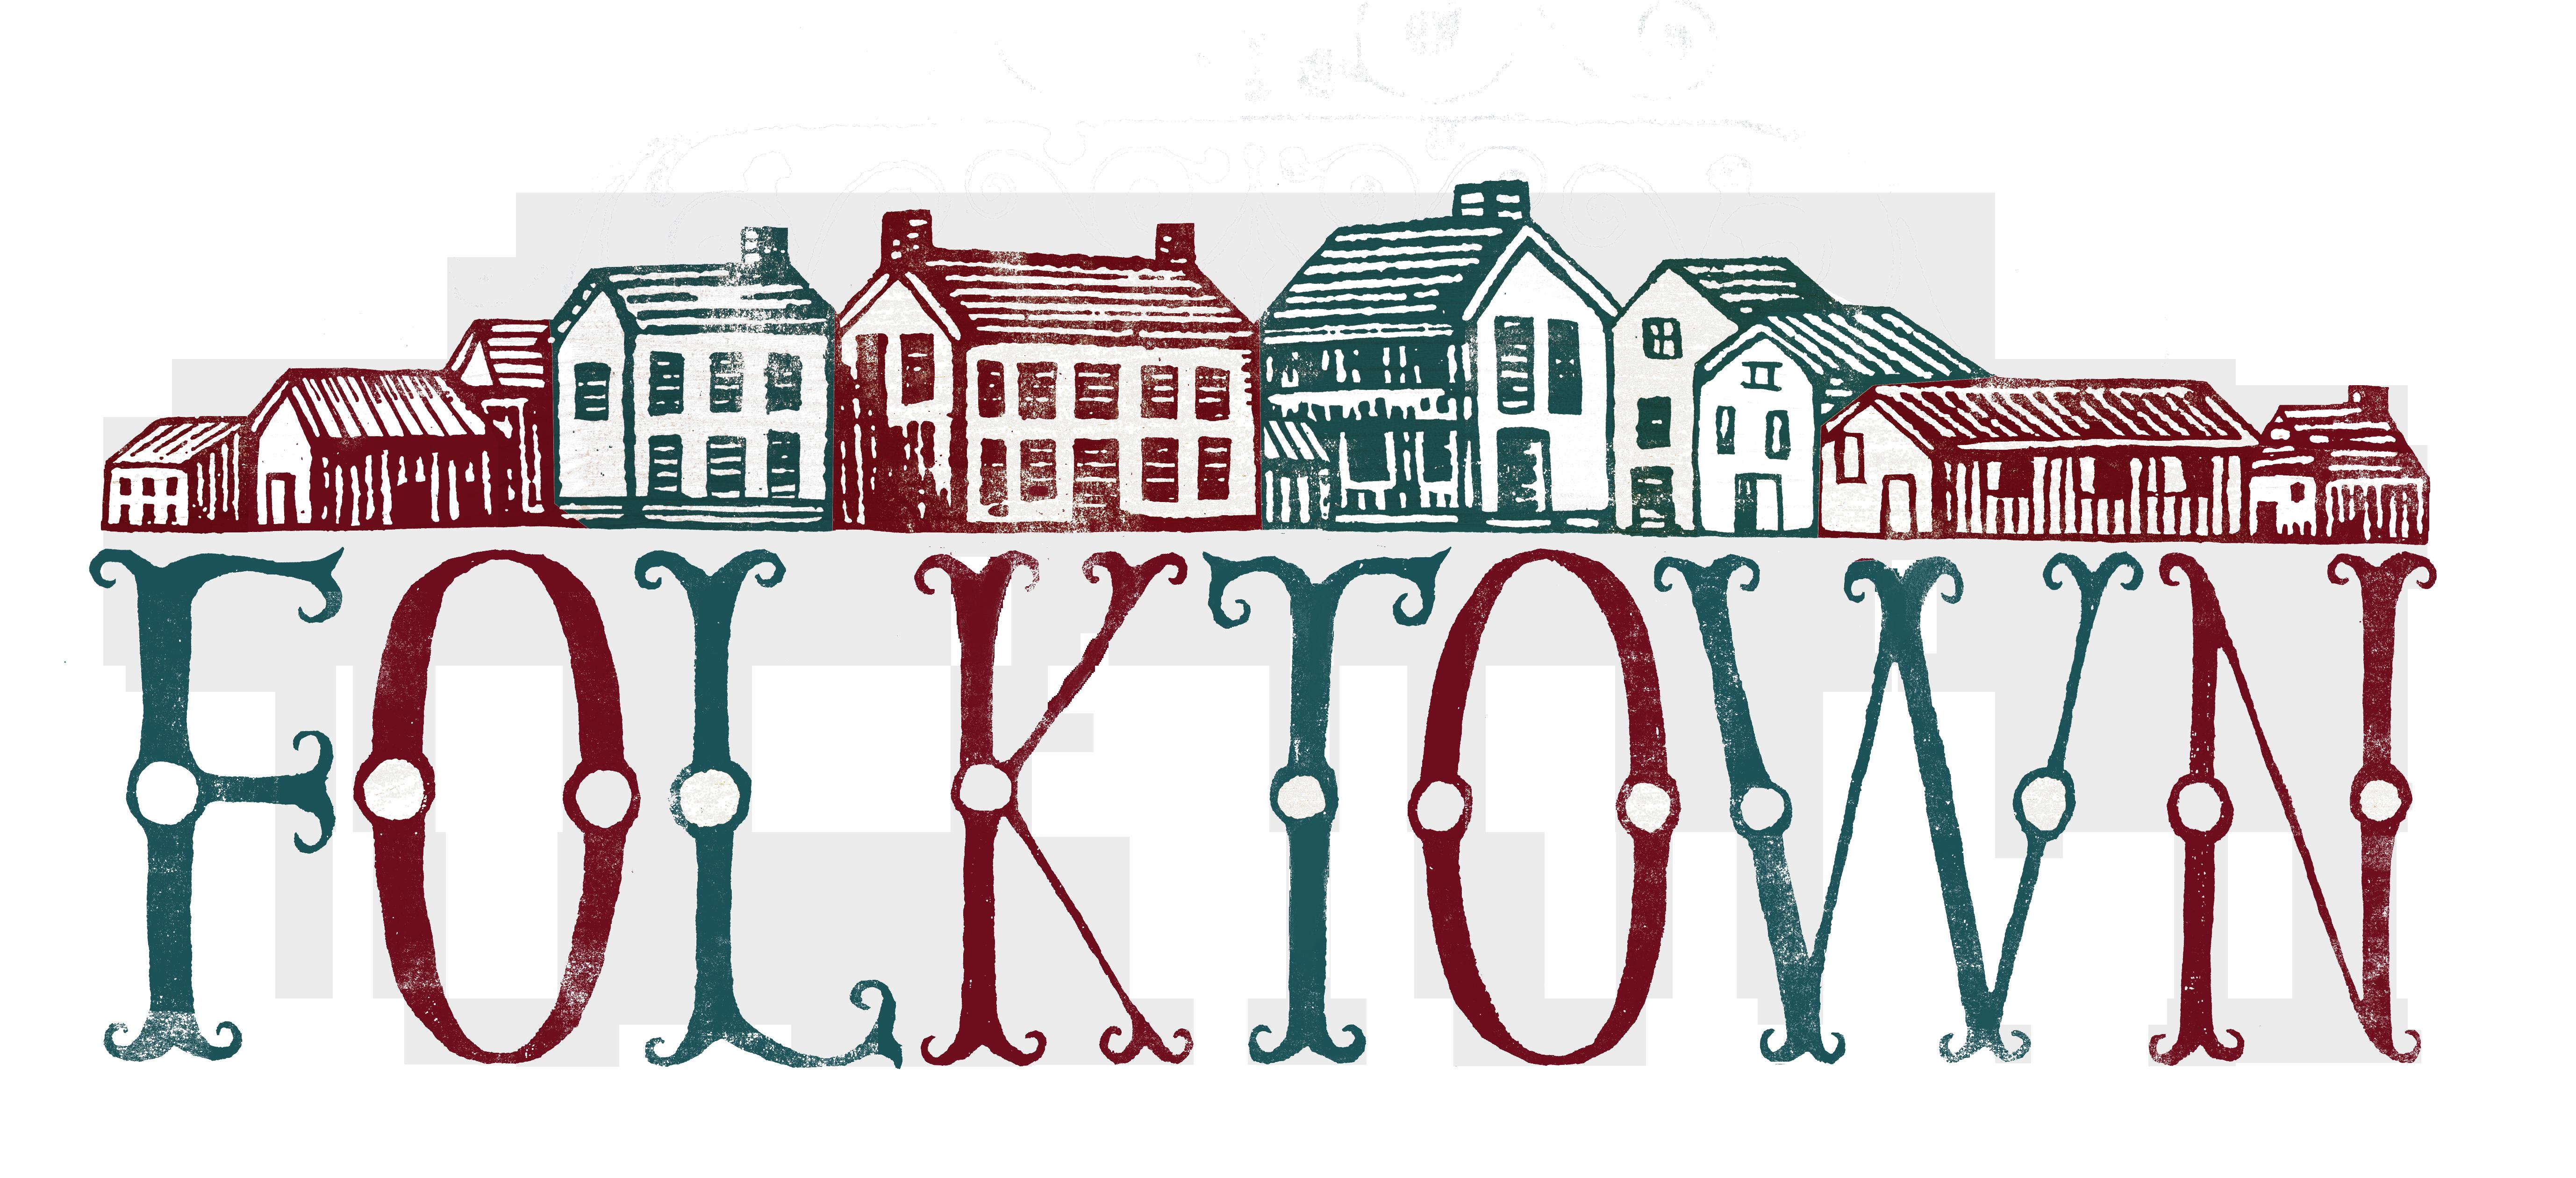 FolktownSimple2